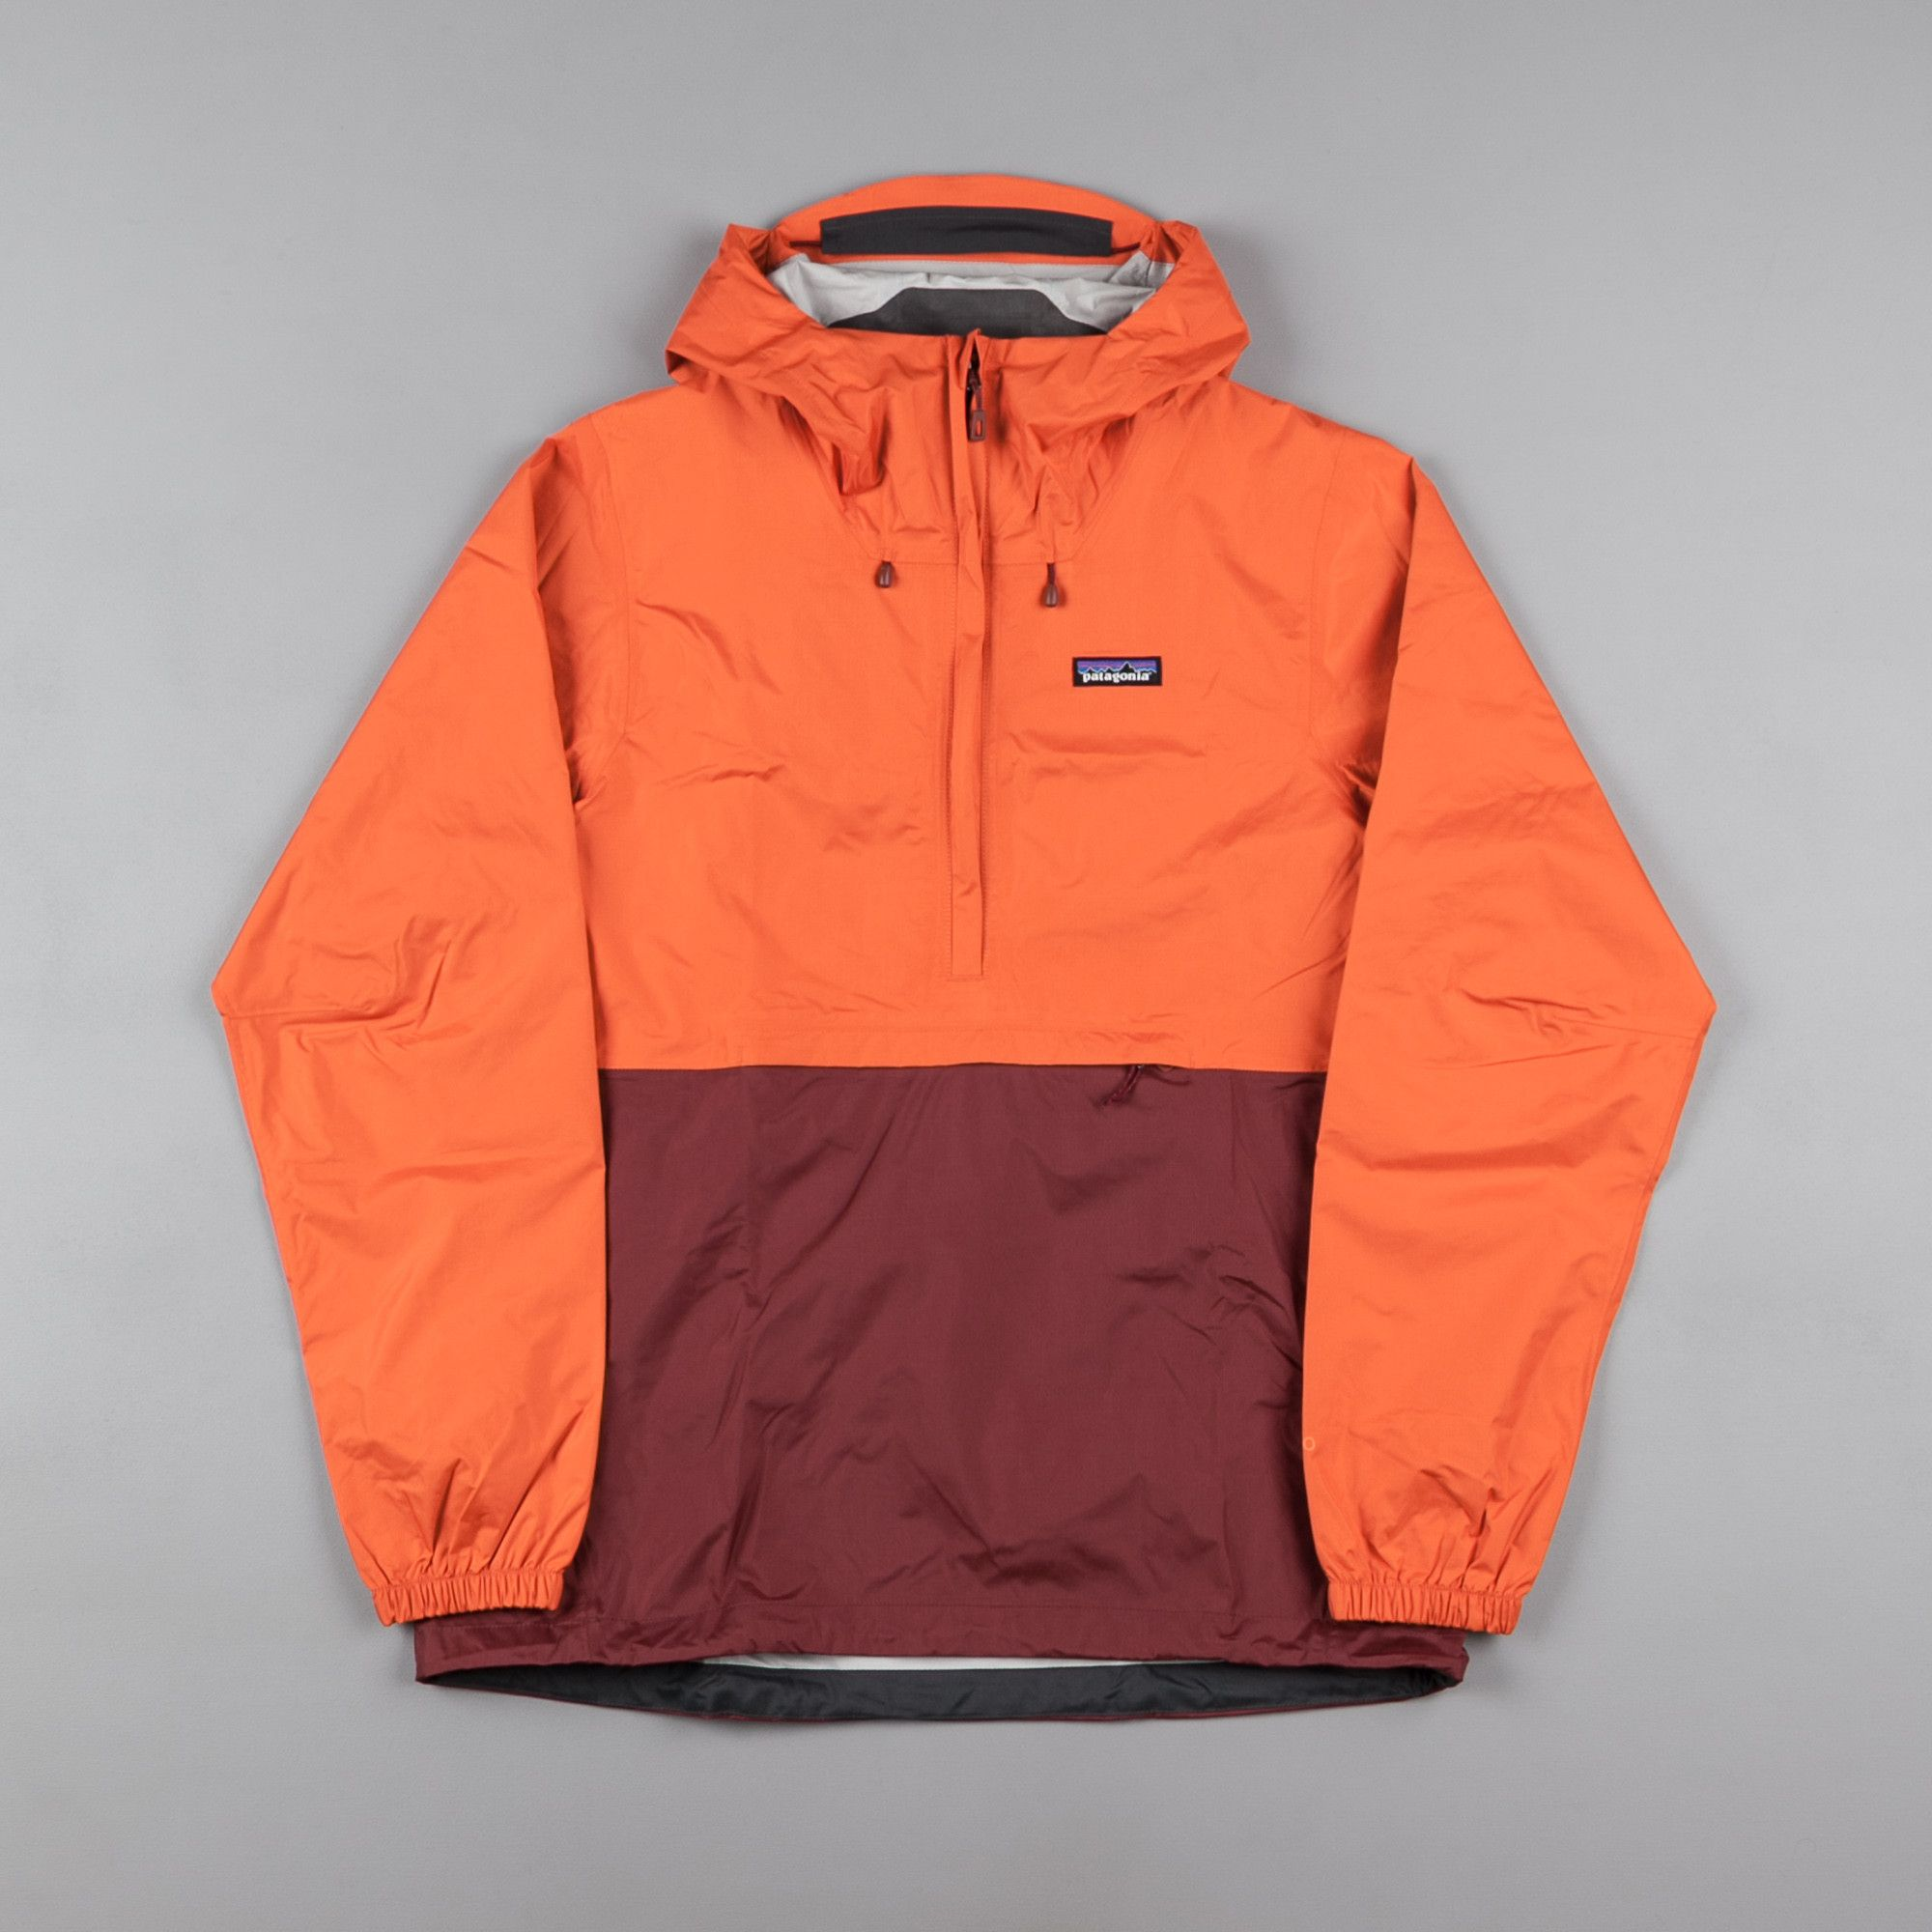 Patagonia Torrentshell Pullover Jacket - Cusco Orange | Patagonia ...